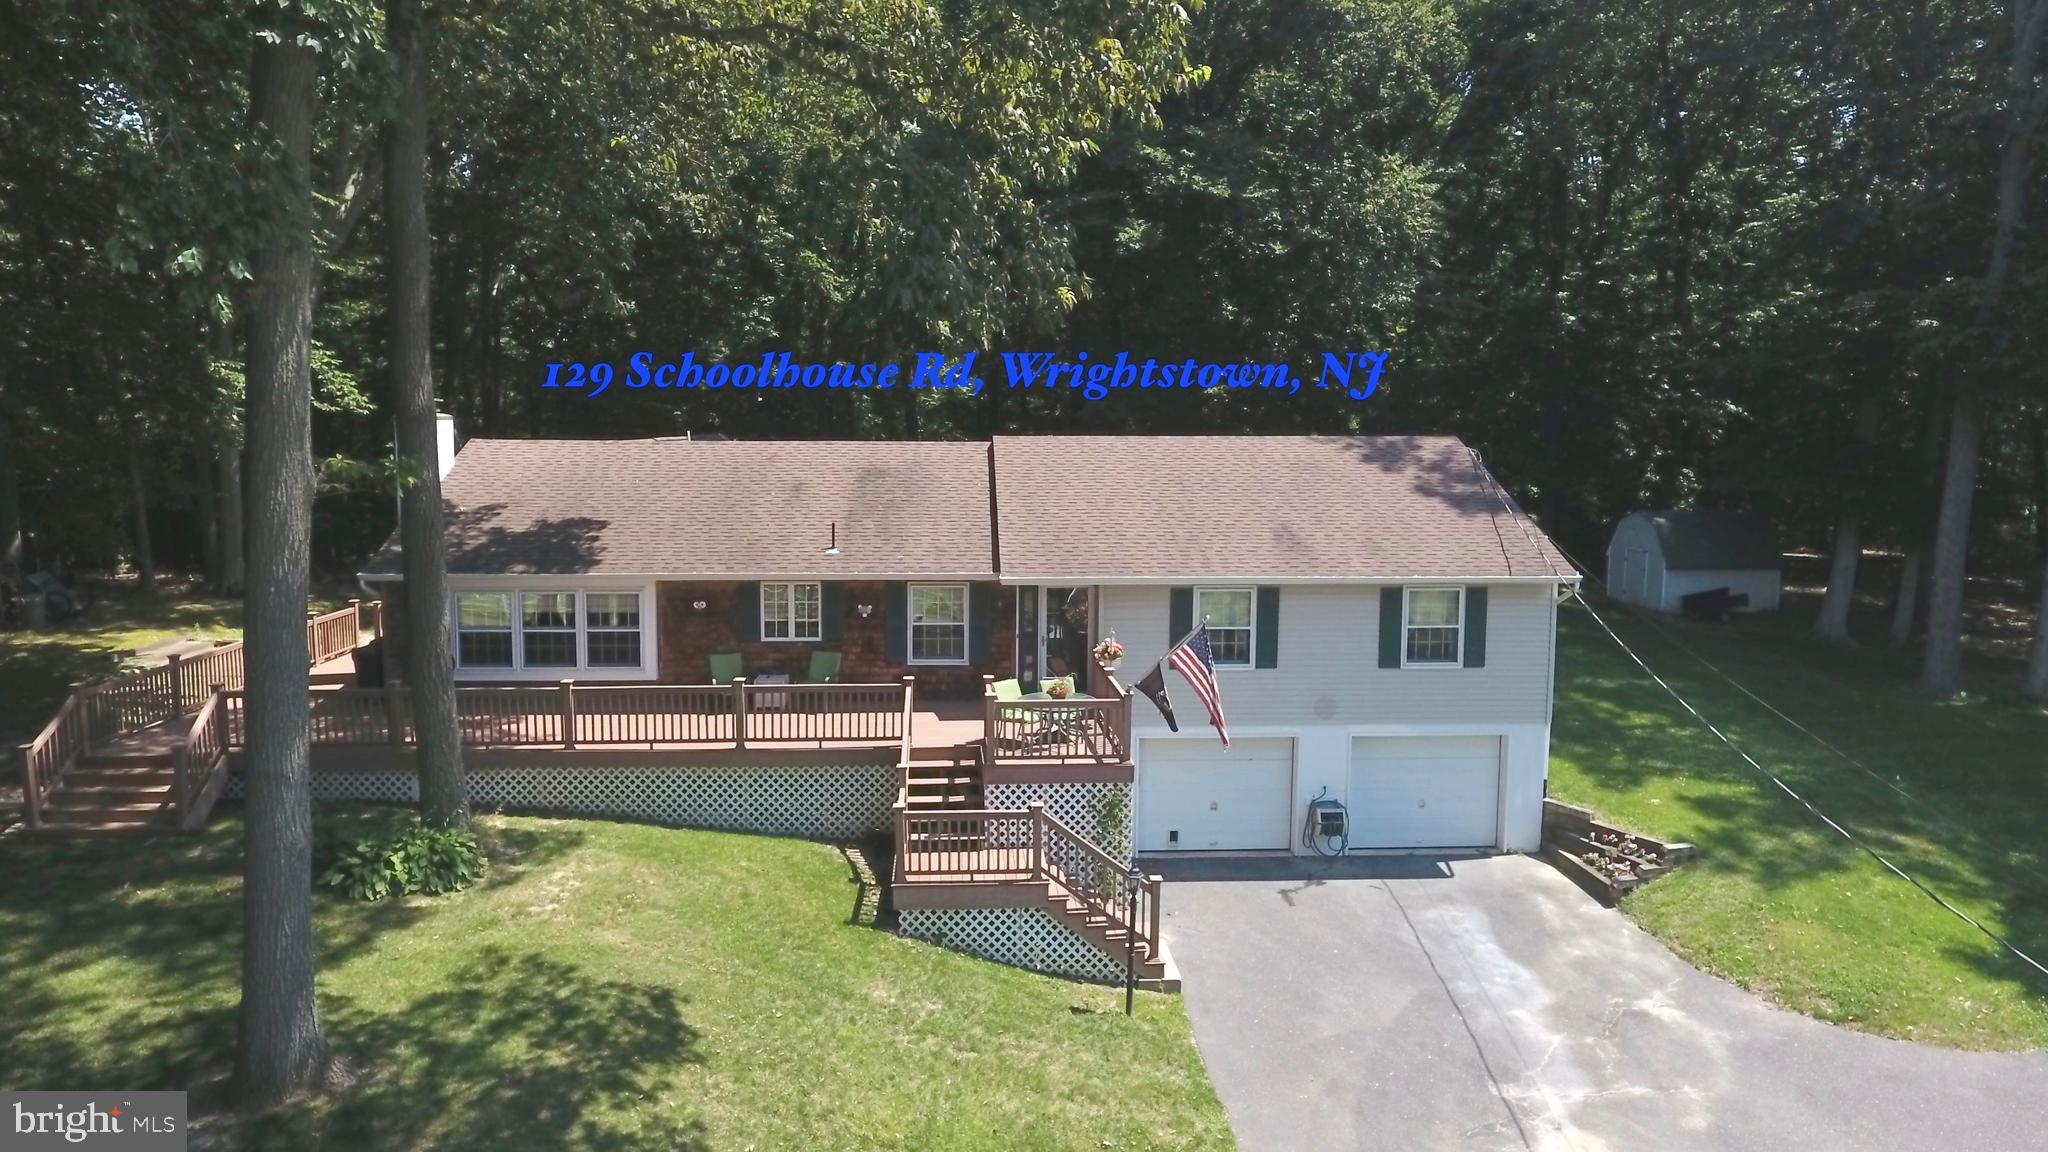 129 SCHOOLHOUSE ROAD, WRIGHTSTOWN, NJ 08562